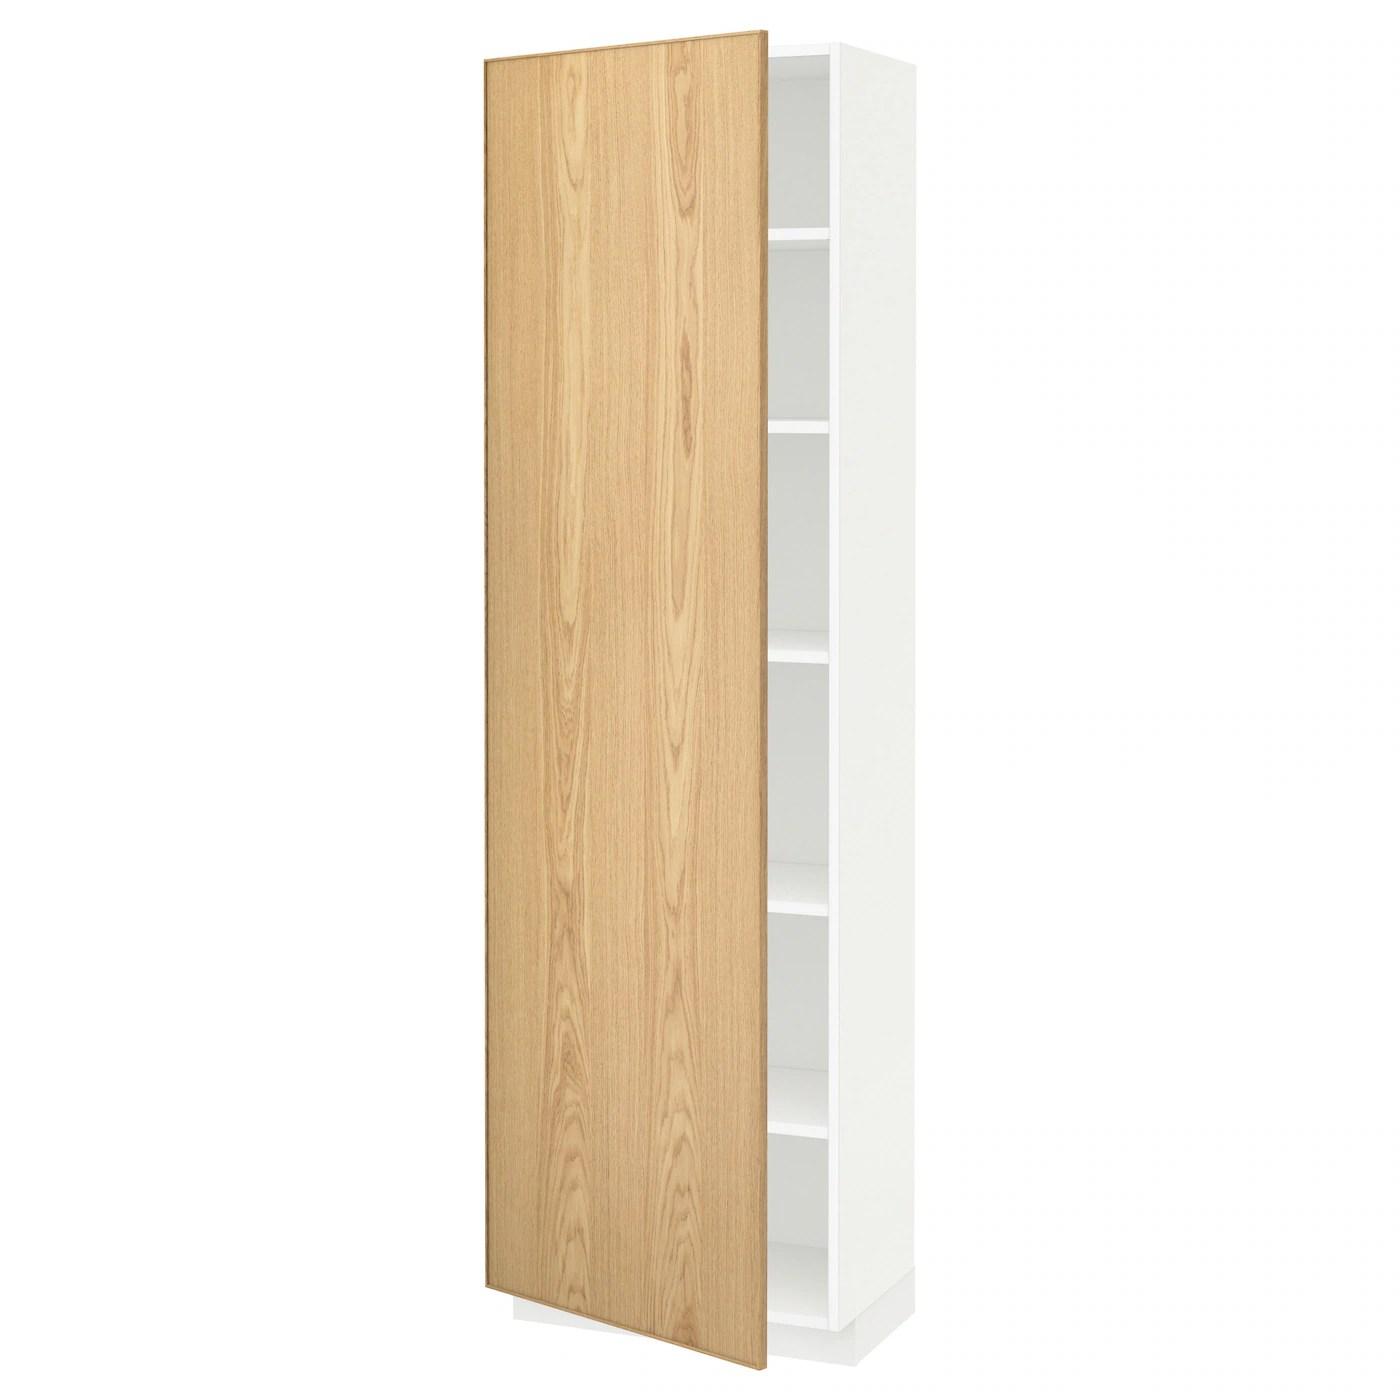 Smalle Witte Ladenkast.Hoog Smal Kastje Cabinets Product Categories Piet Hein Eek